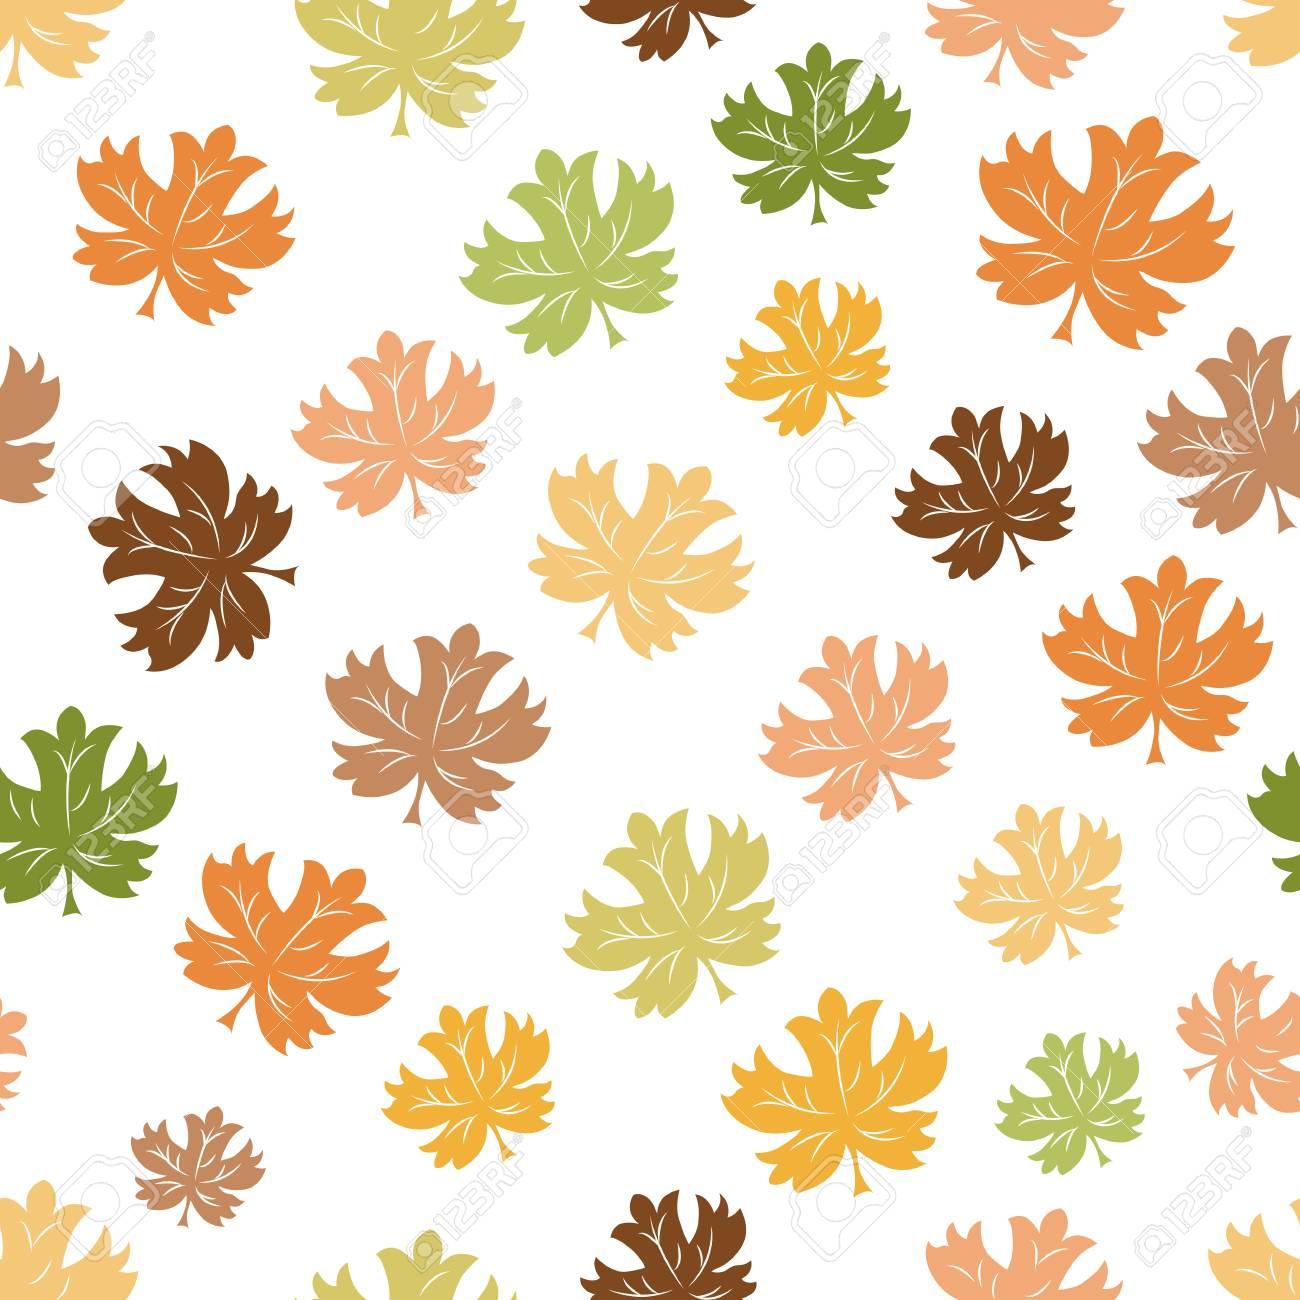 hand drawn cute autumn background seamless pattern of falling